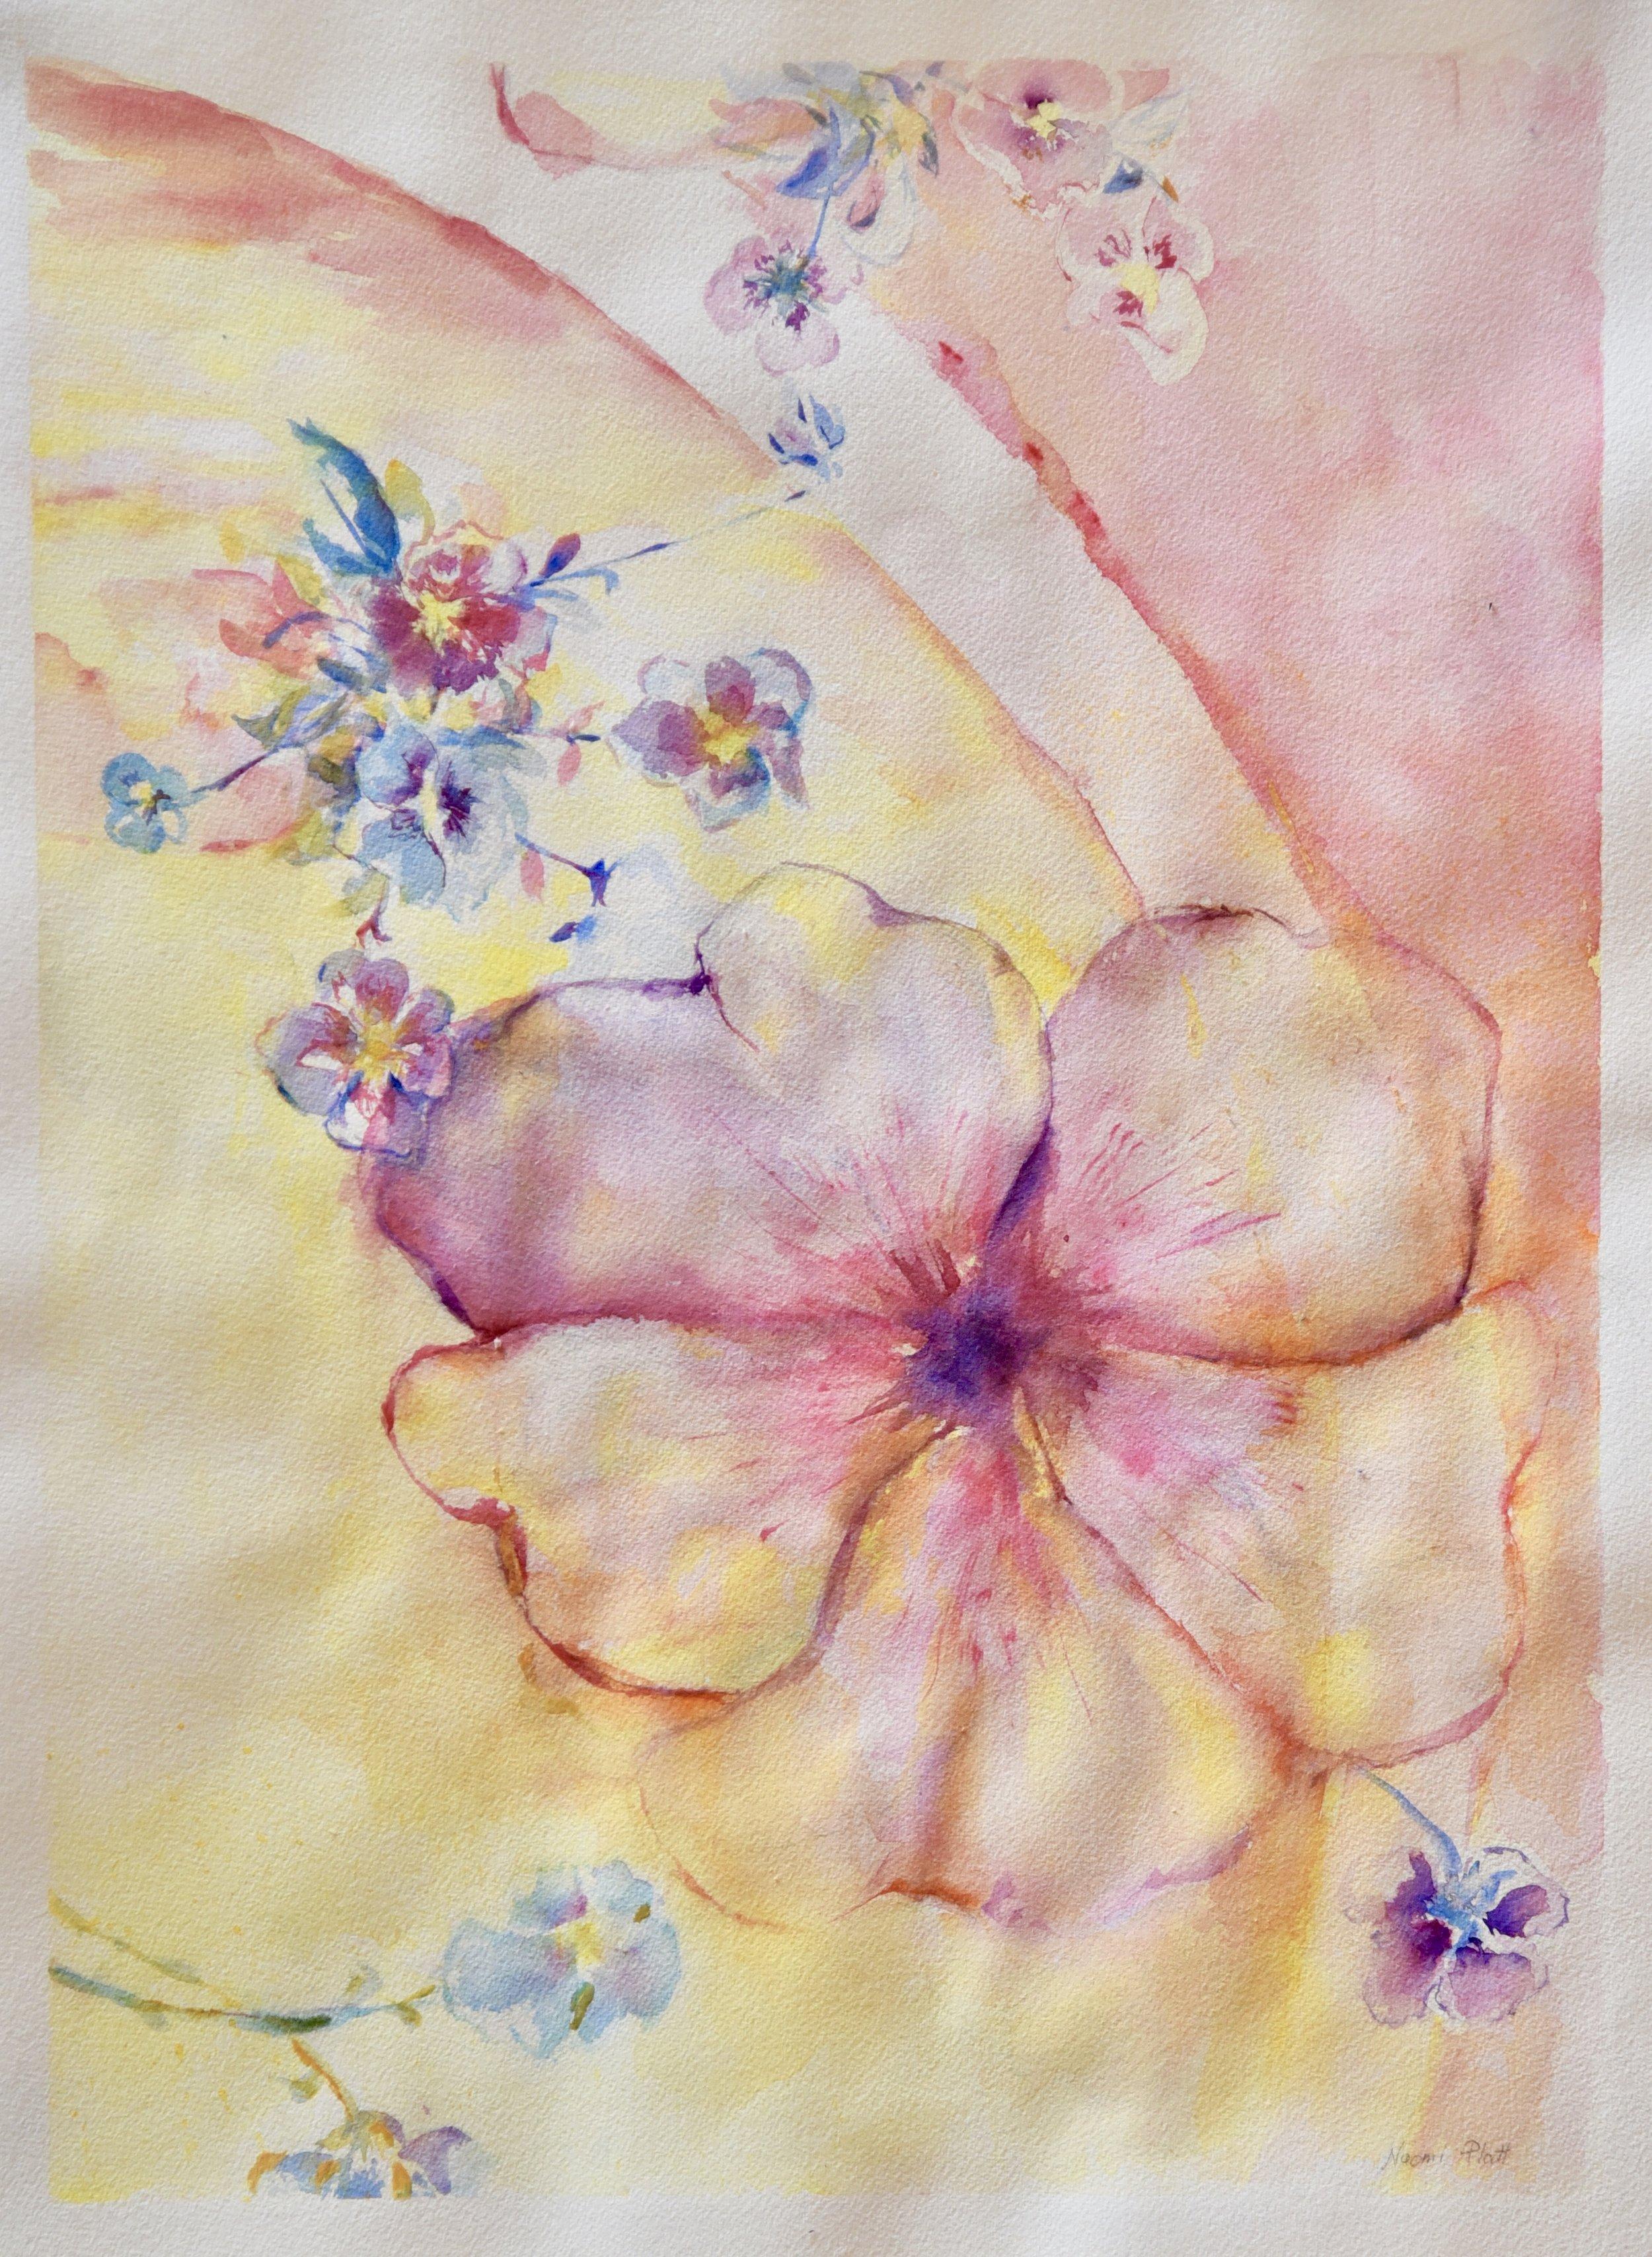 Flowers_22x16_150.jpg